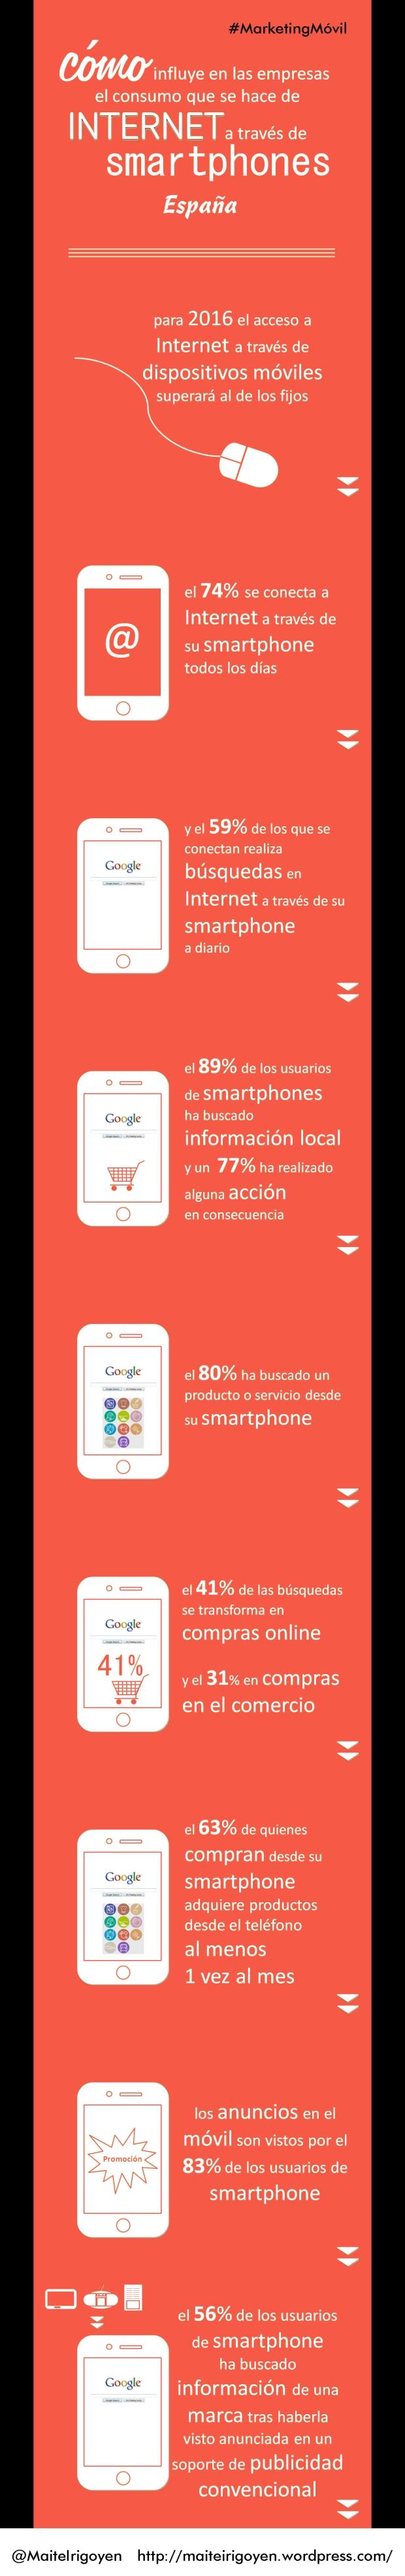 infografía marketing móvil en España